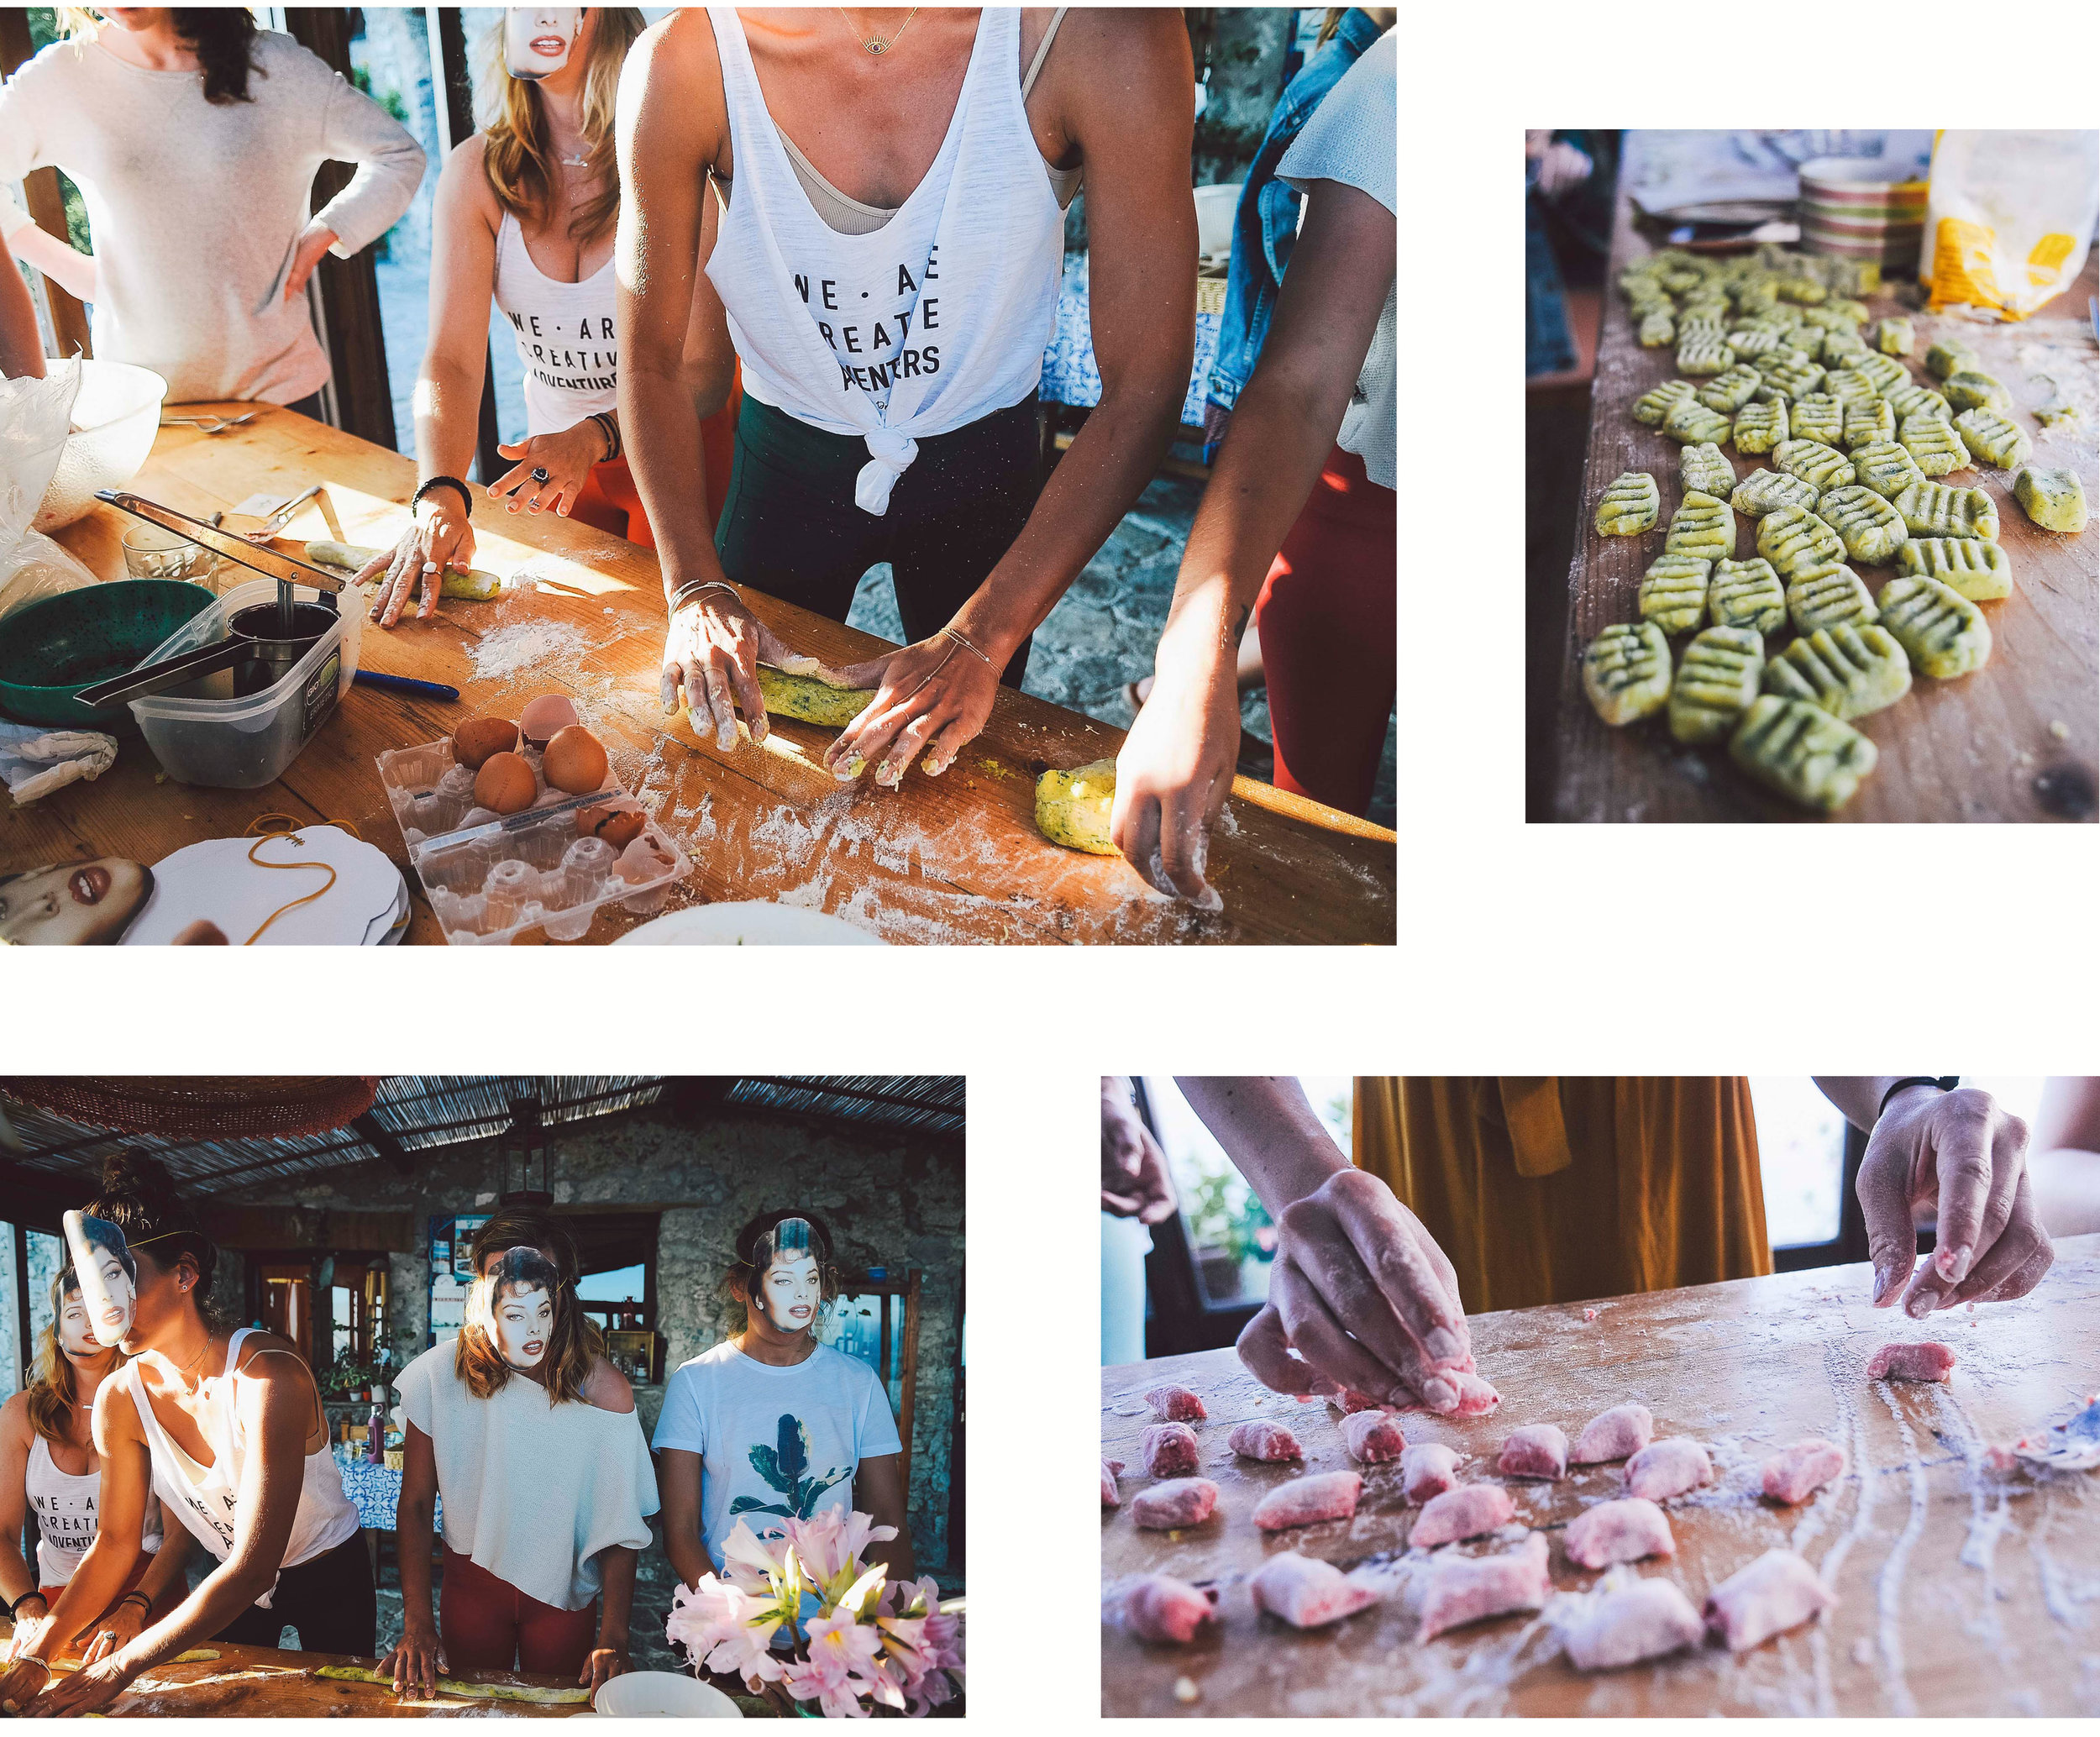 WE+ARE+Amalfi+Food+Workshop+Retreat.jpg